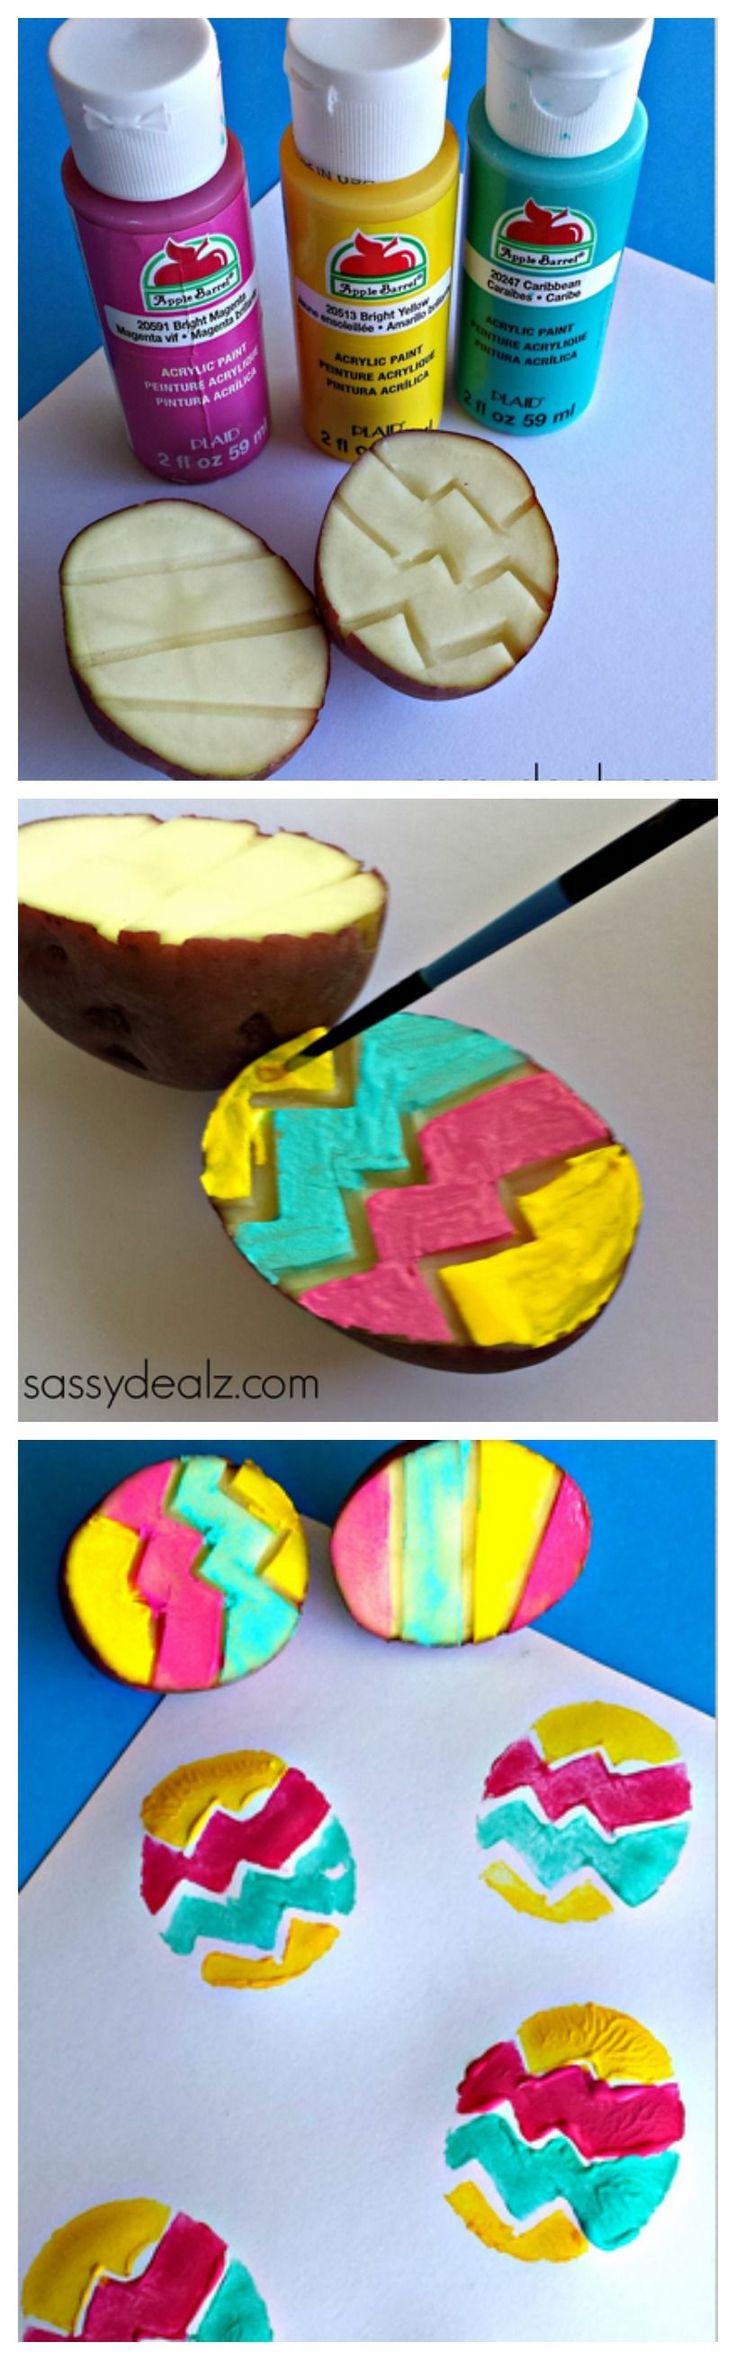 ~Easter Egg Potato Stamping Craft for Kids - Sassy Dealz~